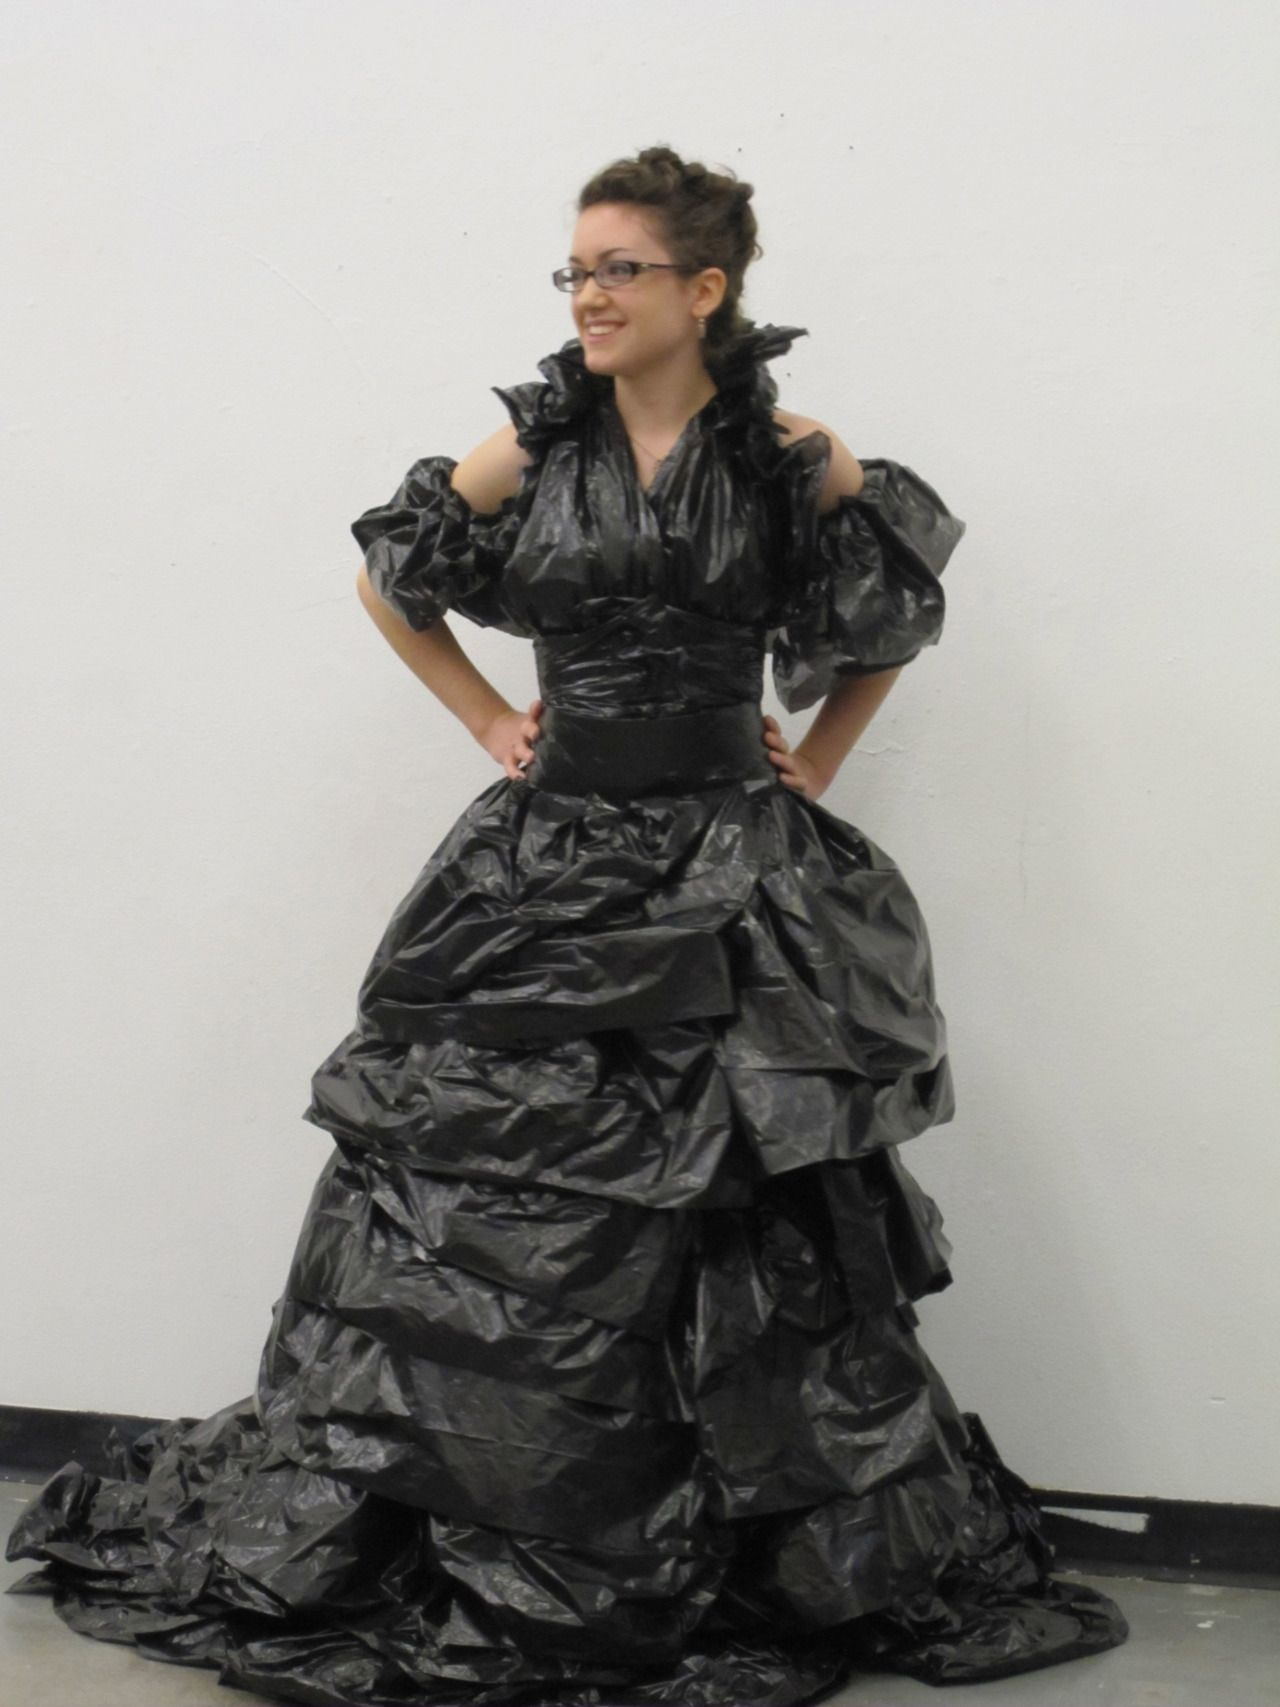 Commit error. Plastic bag dresses